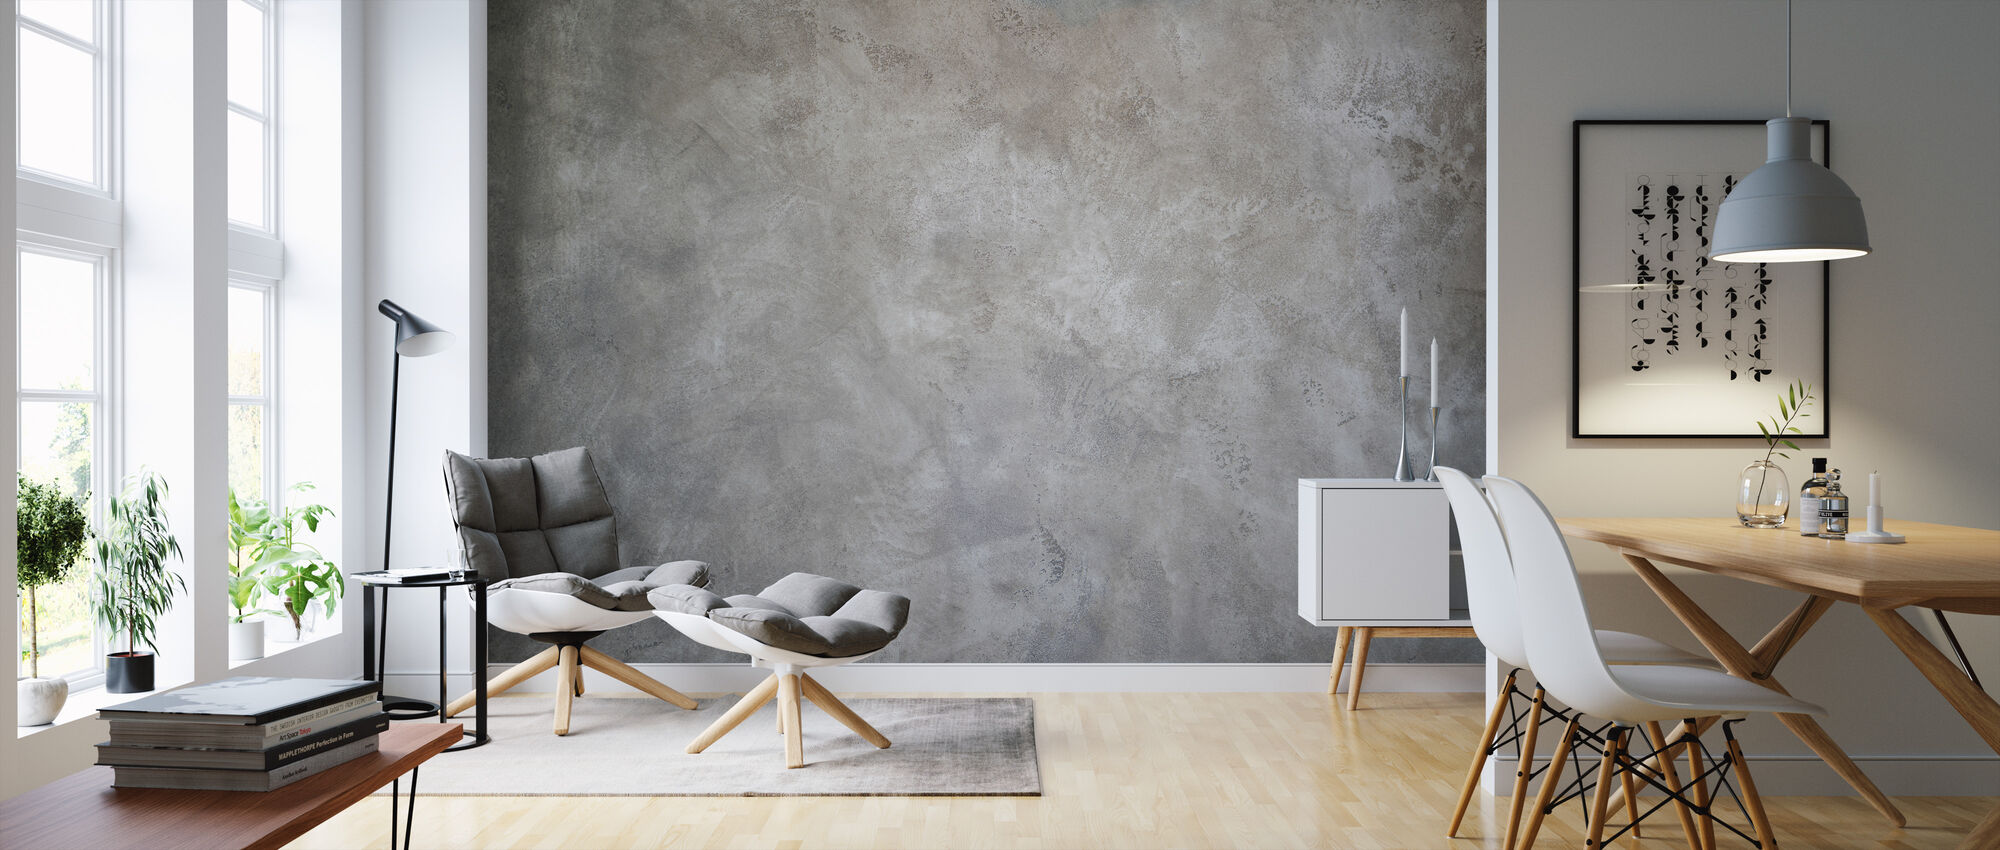 Torn Concrete WAll - Wallpaper - Living Room